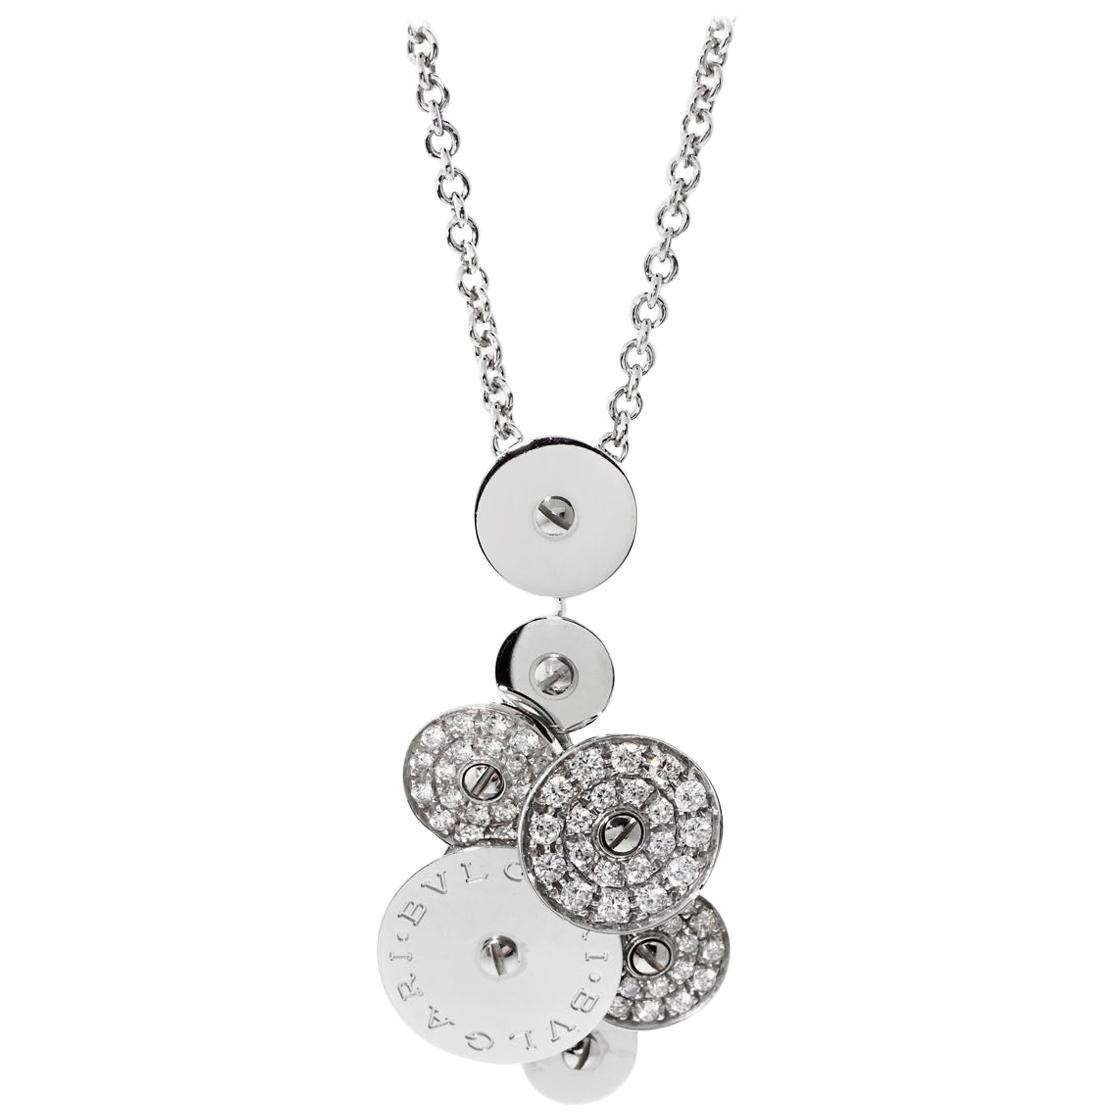 Bvlgari Cicladi Collection Diamond 18 Carat White Gold Pendant and Chain